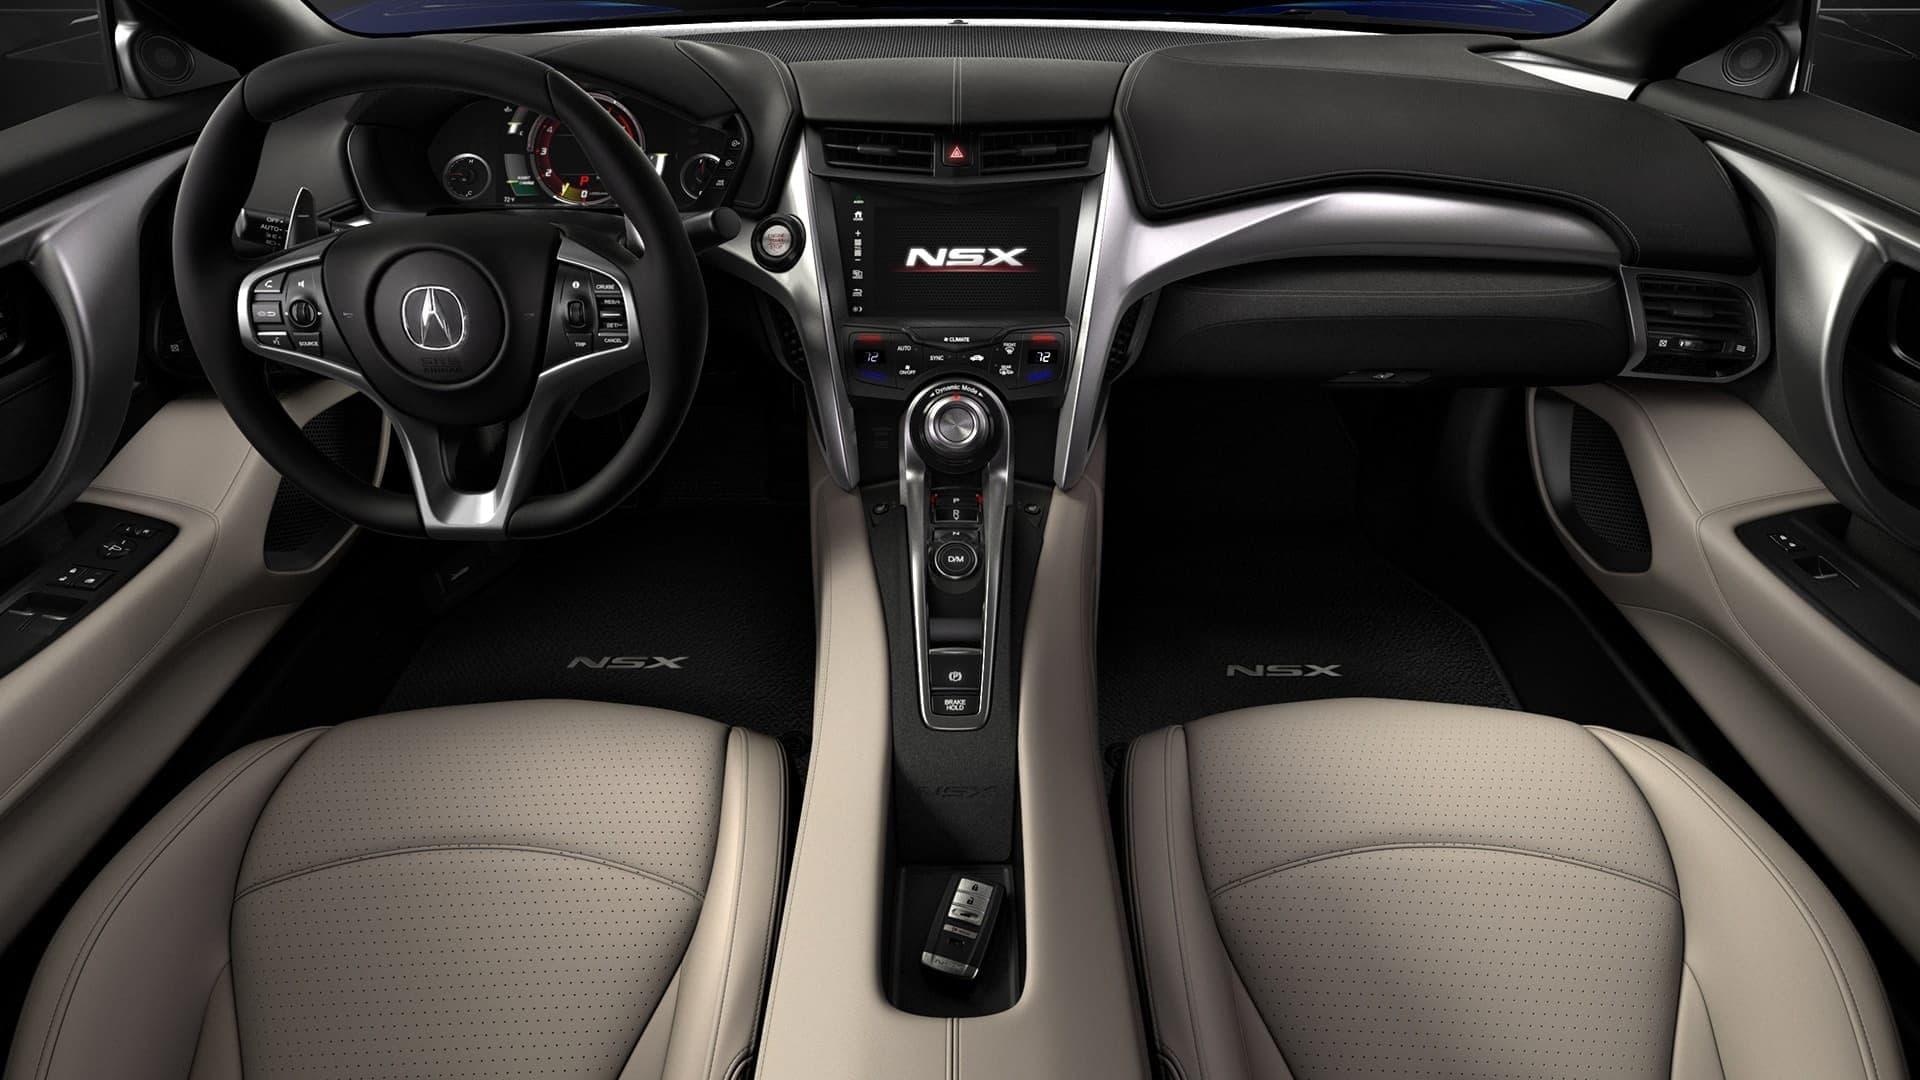 2017 Acura Nsx Vs 2017 Nissan Gt R Near Washington Dc